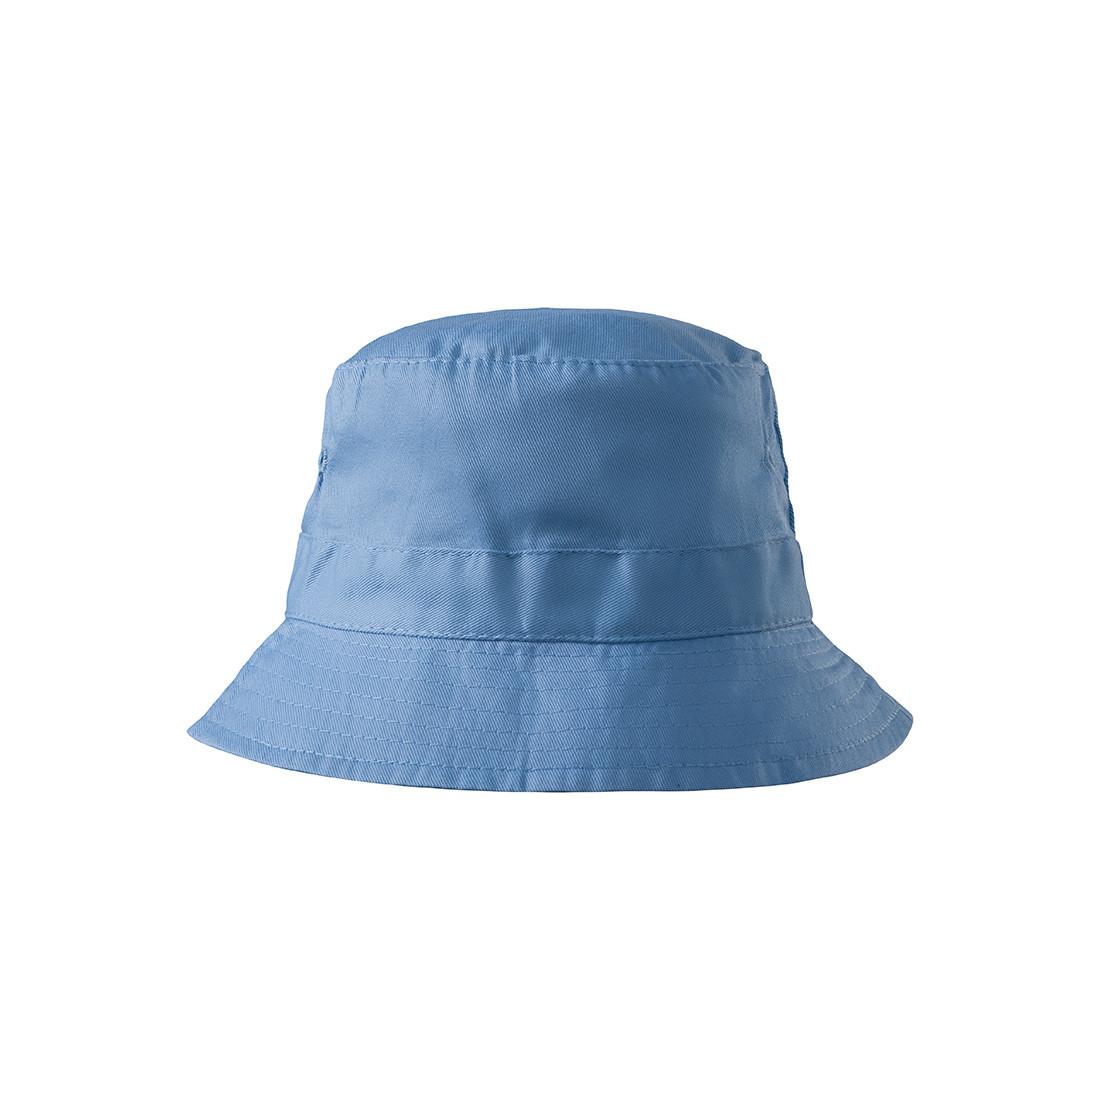 Palarie CLASSIC - Imbracaminte de protectie